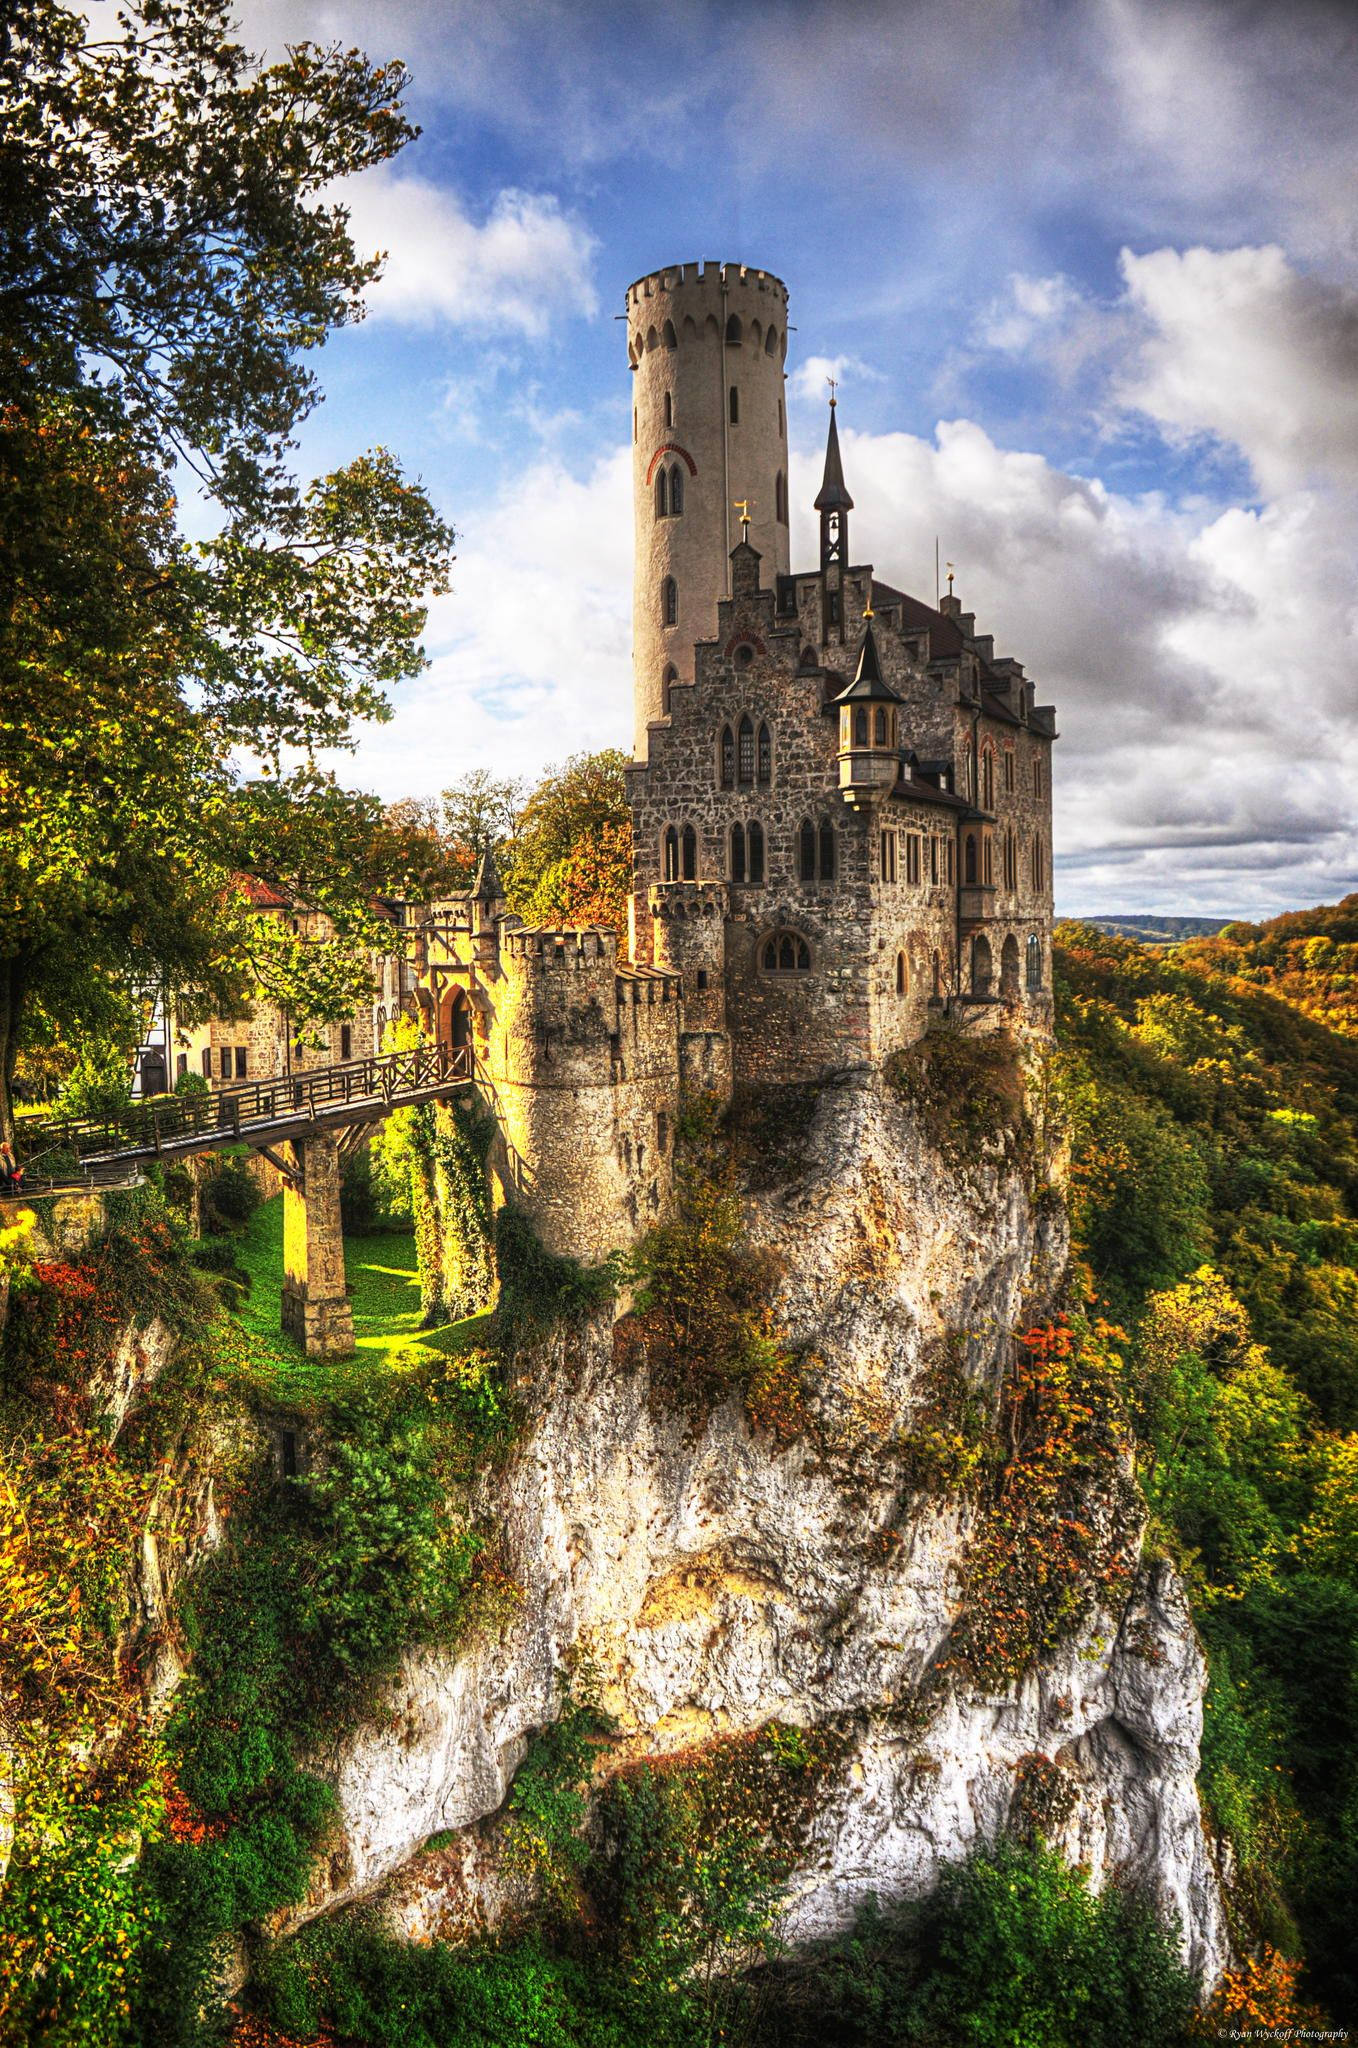 Castle on the Cliff - Lichtenstein Castle - Germany